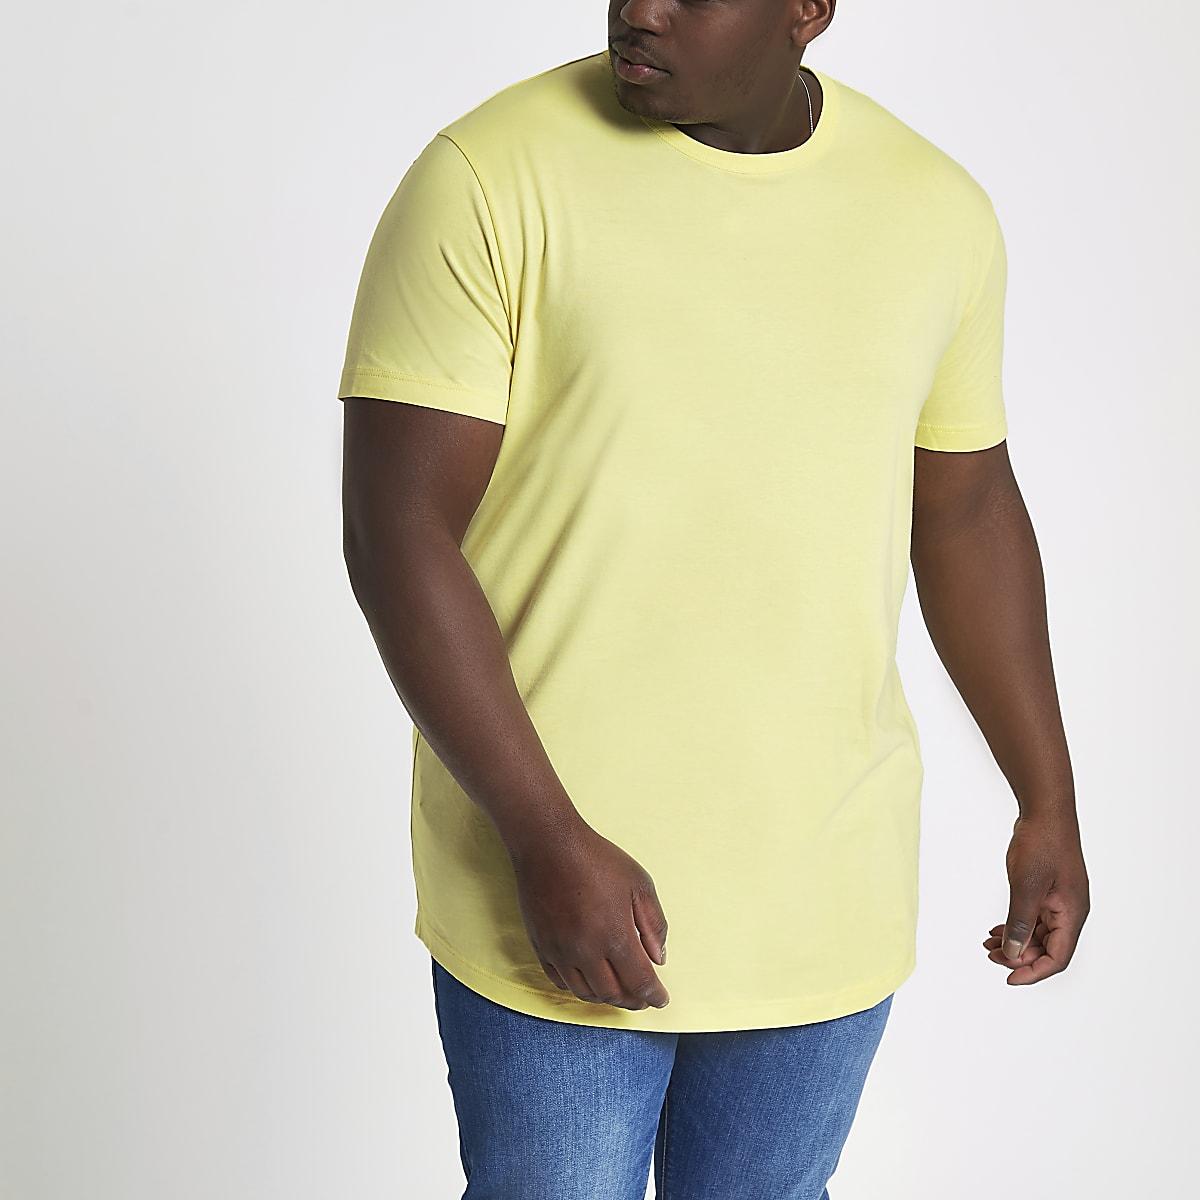 Big and Tall yellow curved hem T-shirt